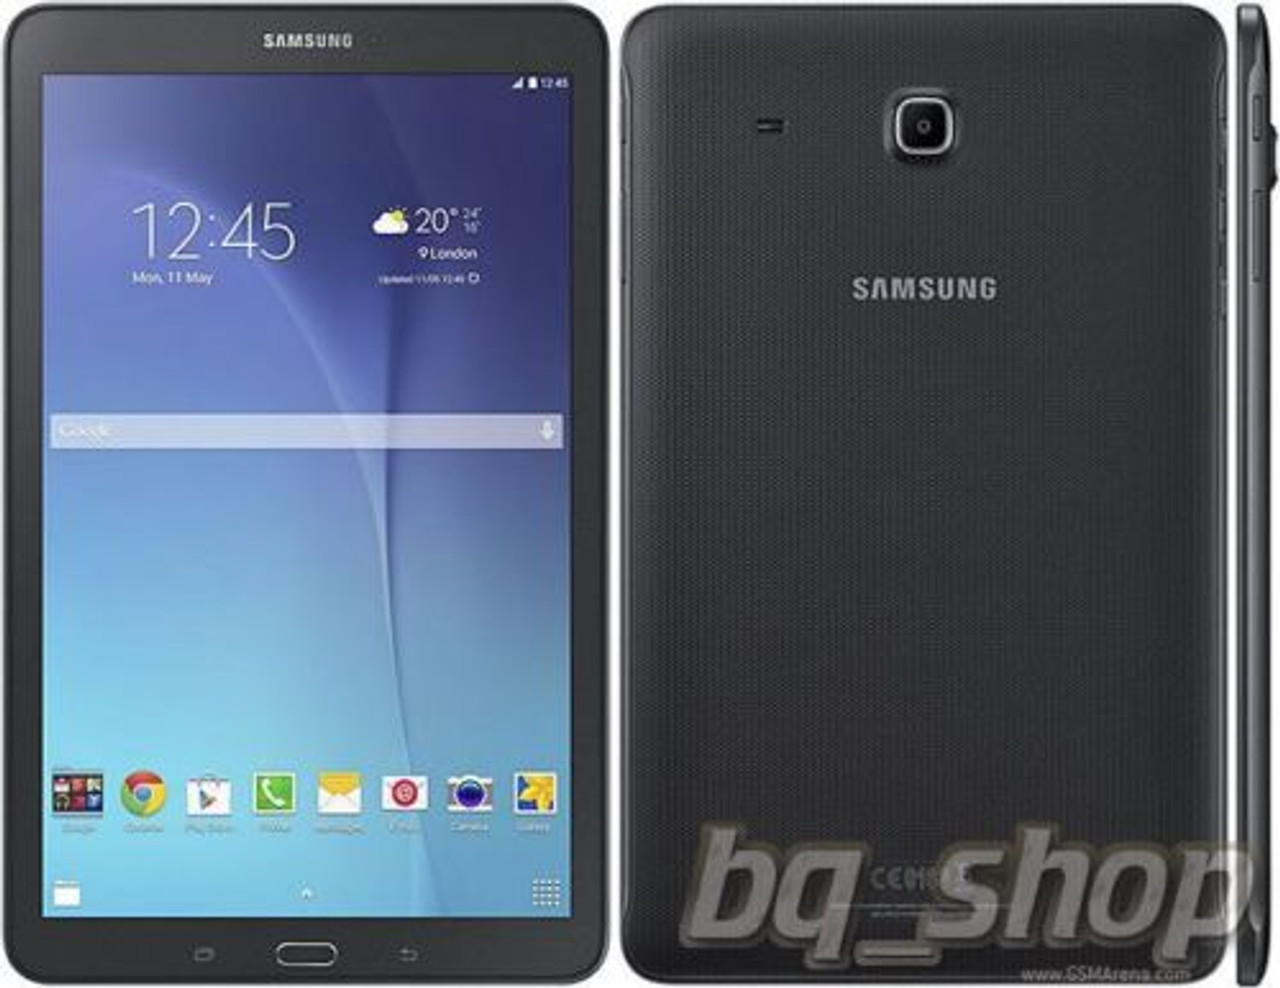 Black Samsung Galaxy Tab E 9.6 16GB WiFi